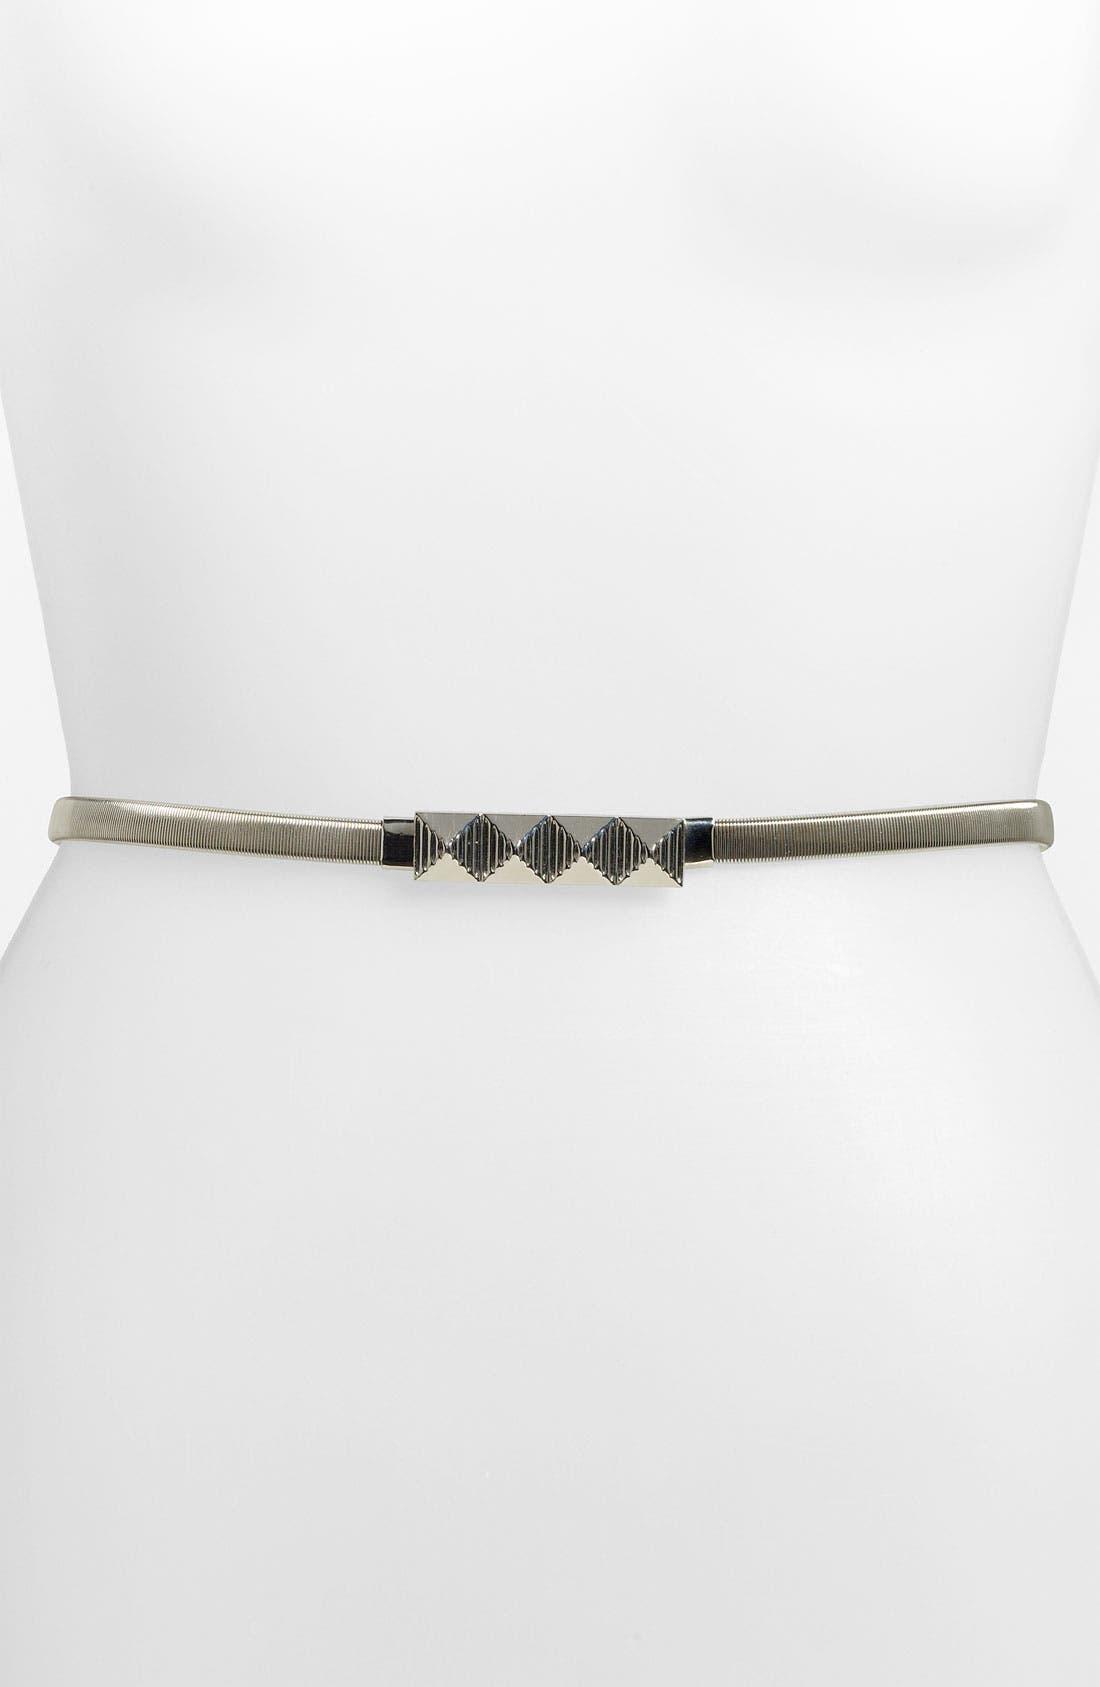 Main Image - Lulu 'Pyramid' Metal Stretch Belt